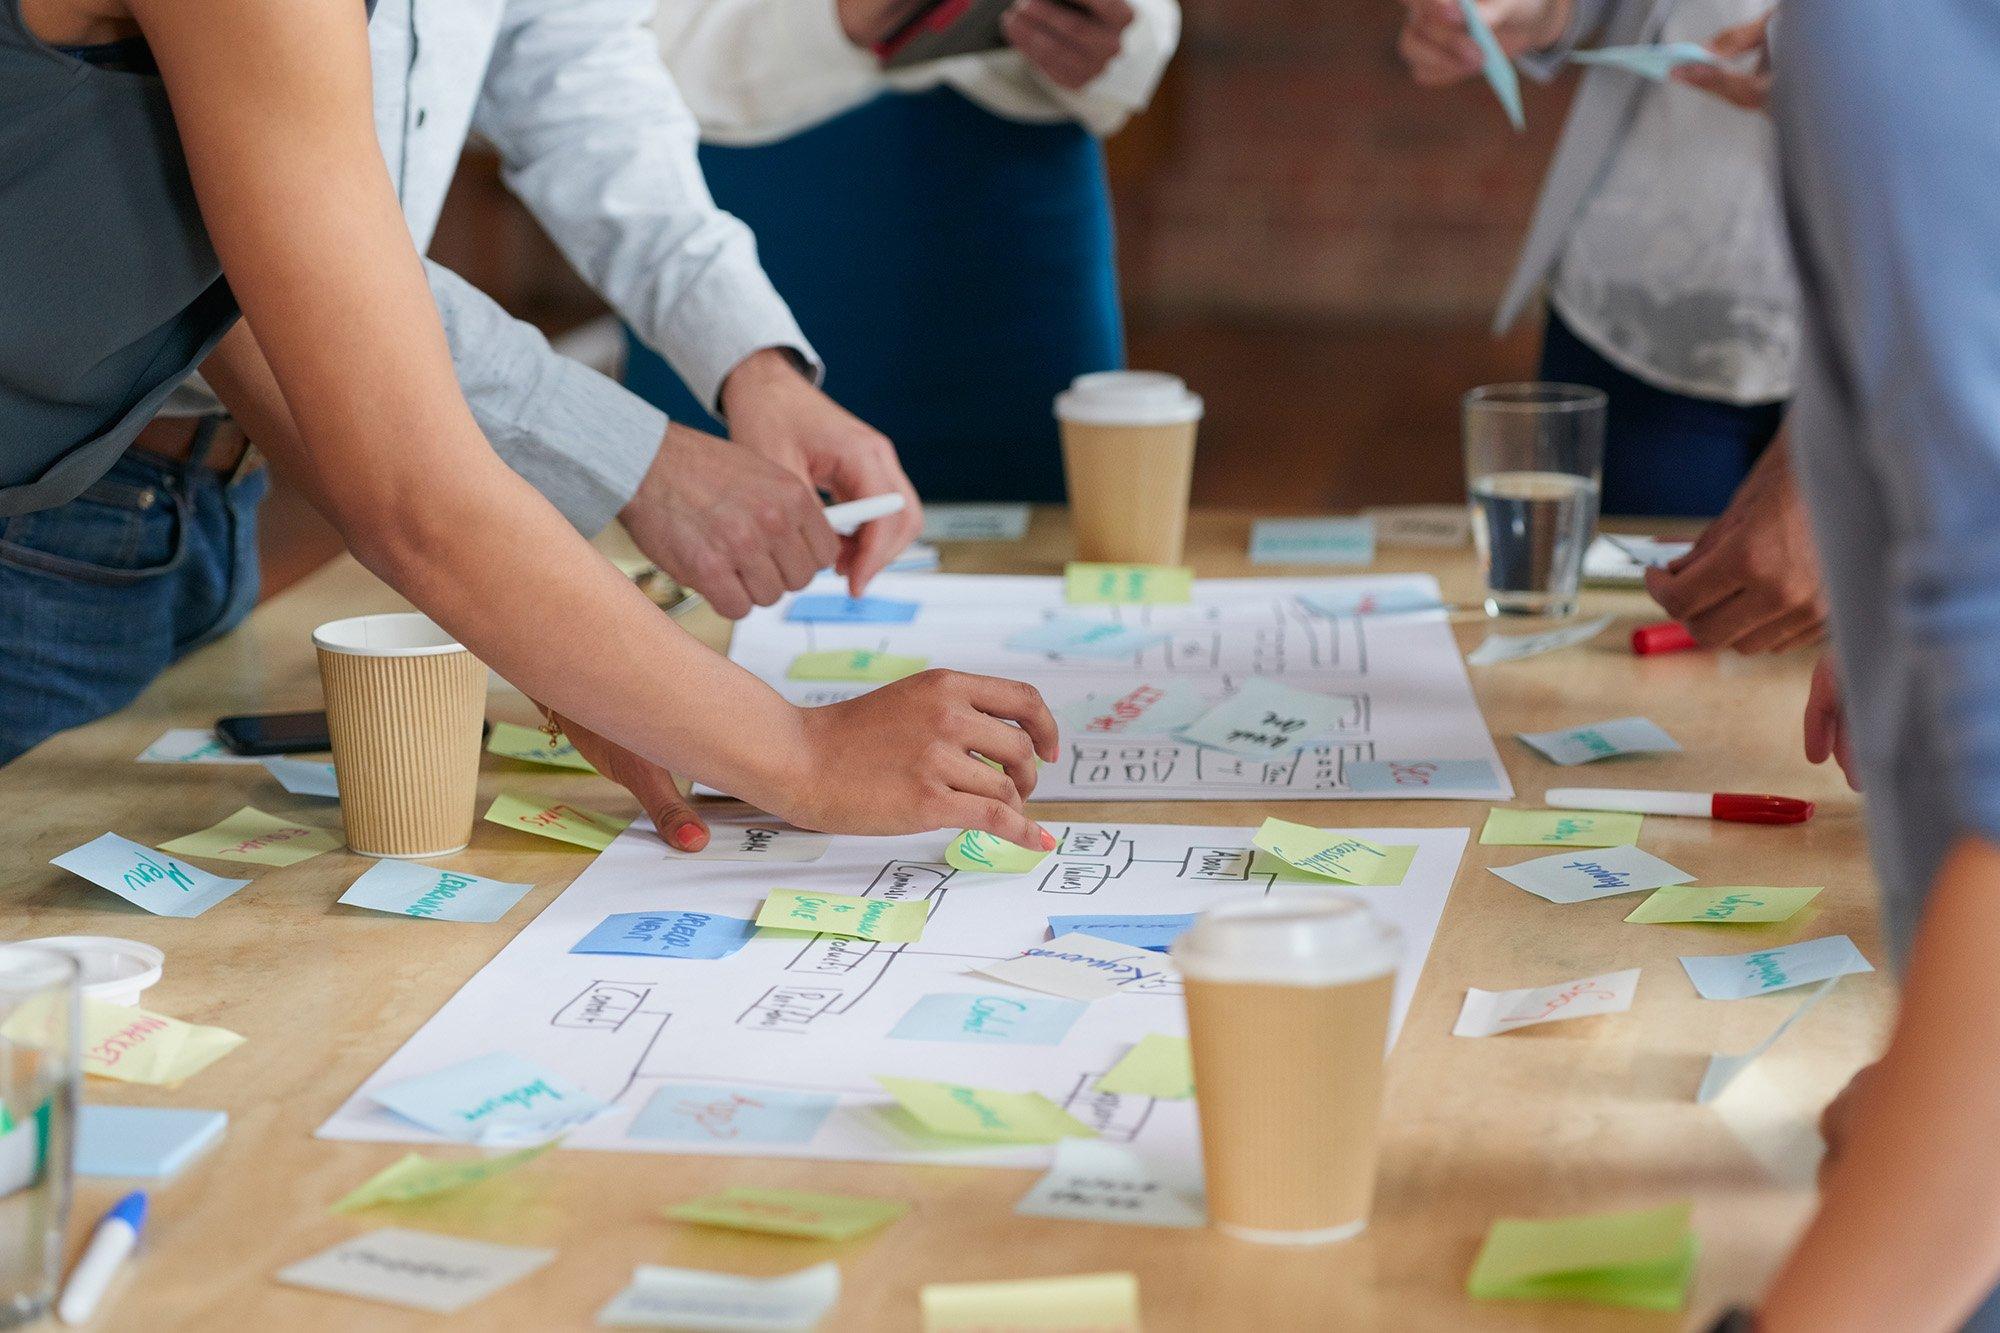 Brainstorming around desk with postits 2